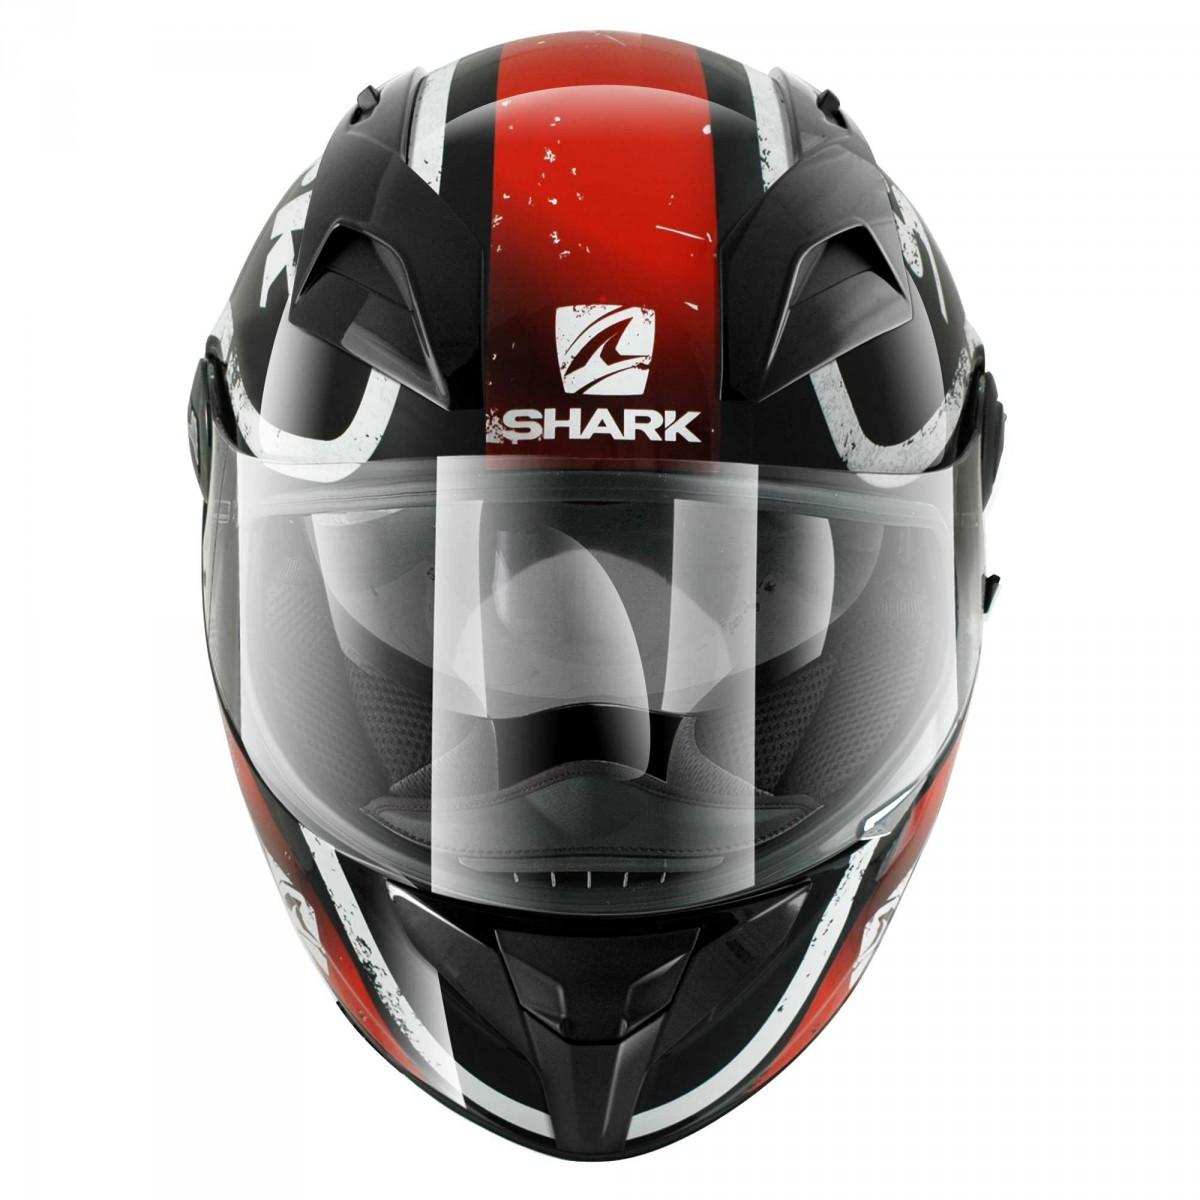 Capacete Shark  Vision-R2 Escapade KRW  - Super Bike - Loja Oficial Alpinestars